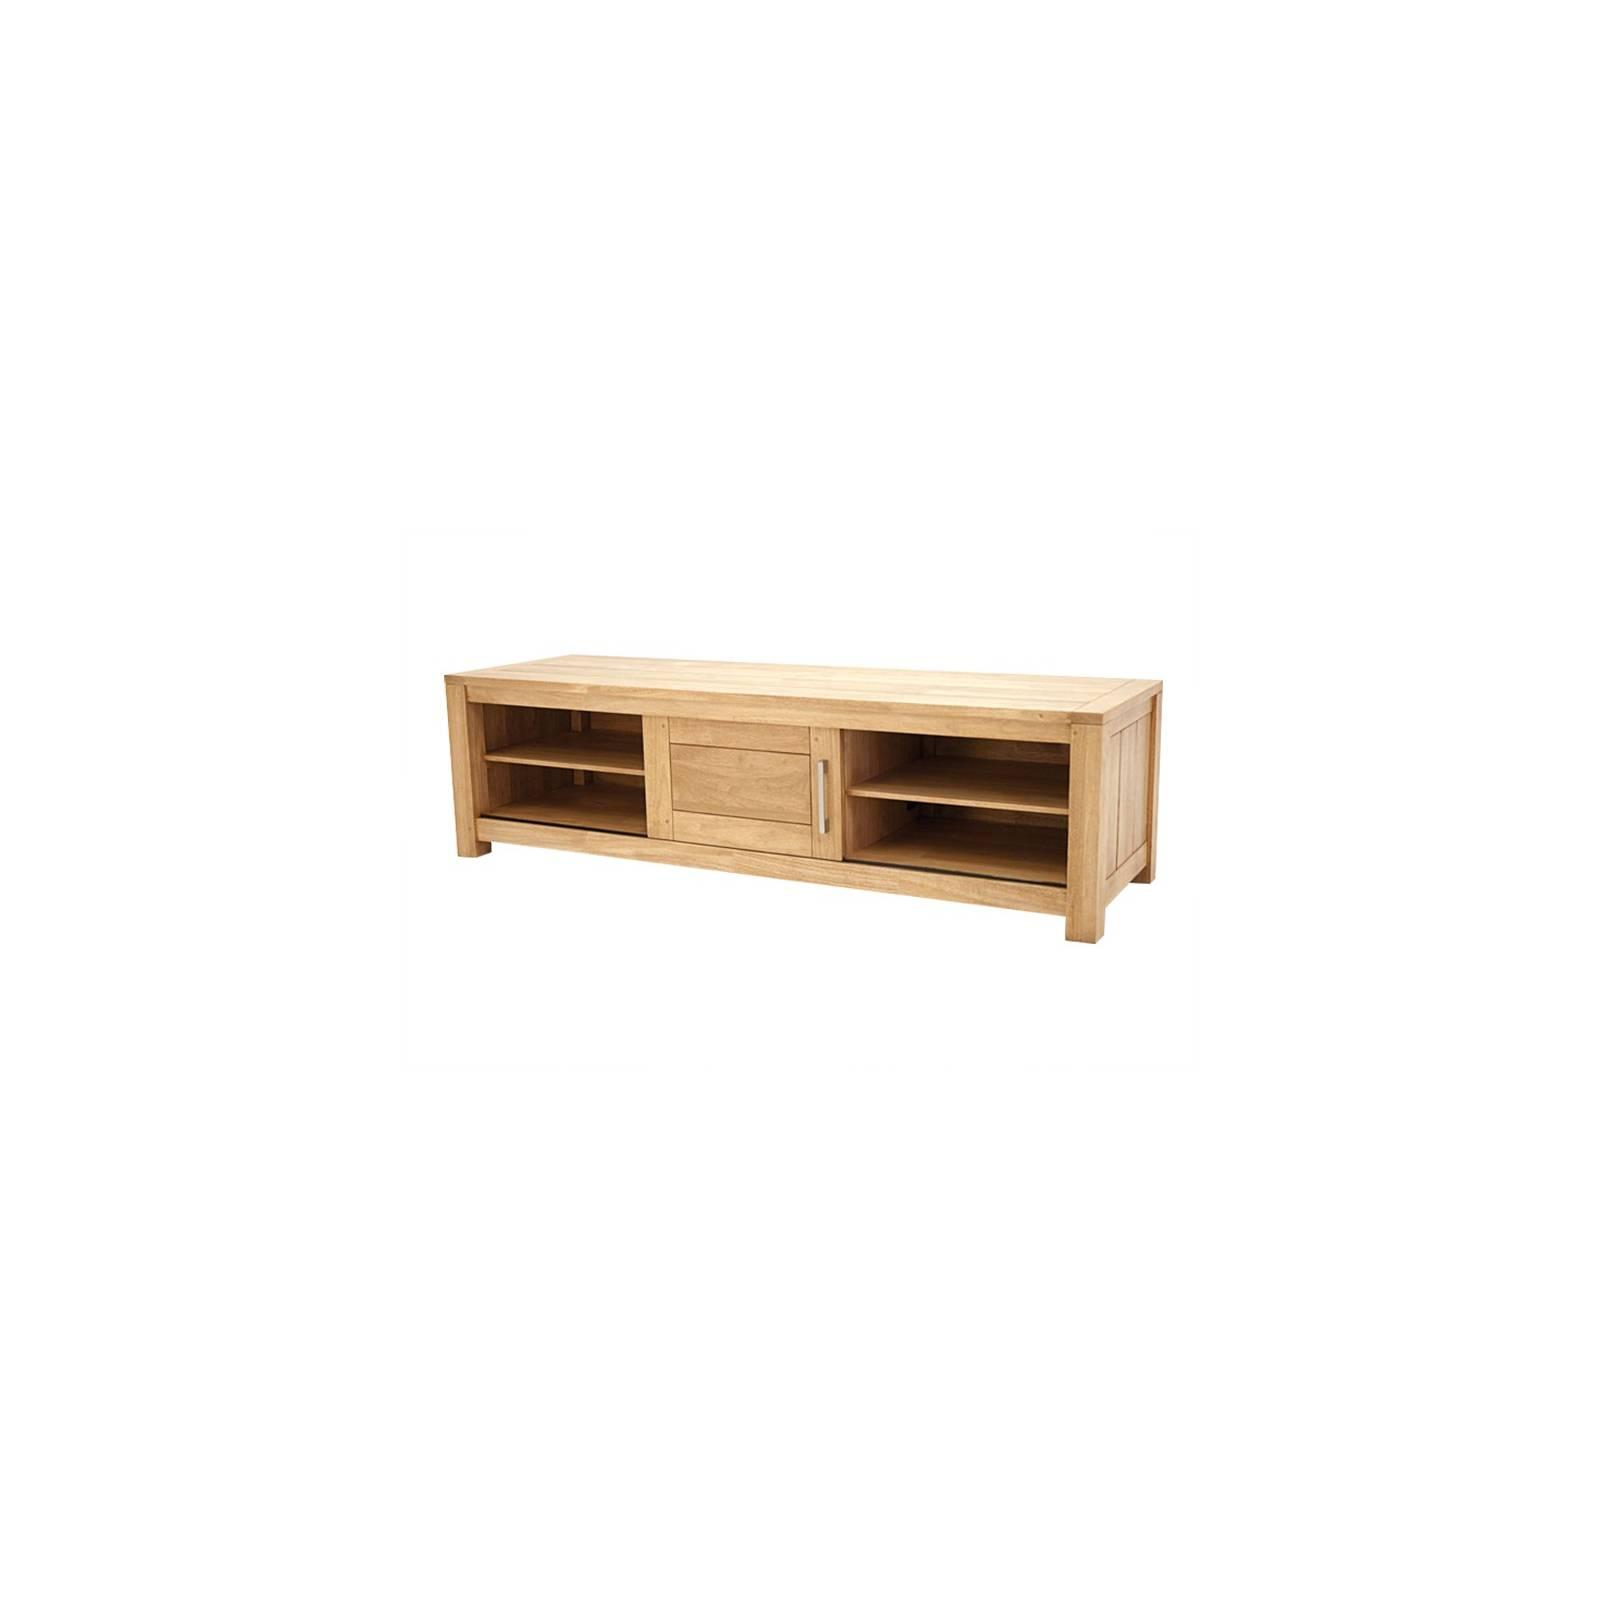 Meuble Tv Grand Modèle Broadway Hévéa - meuble bois massif